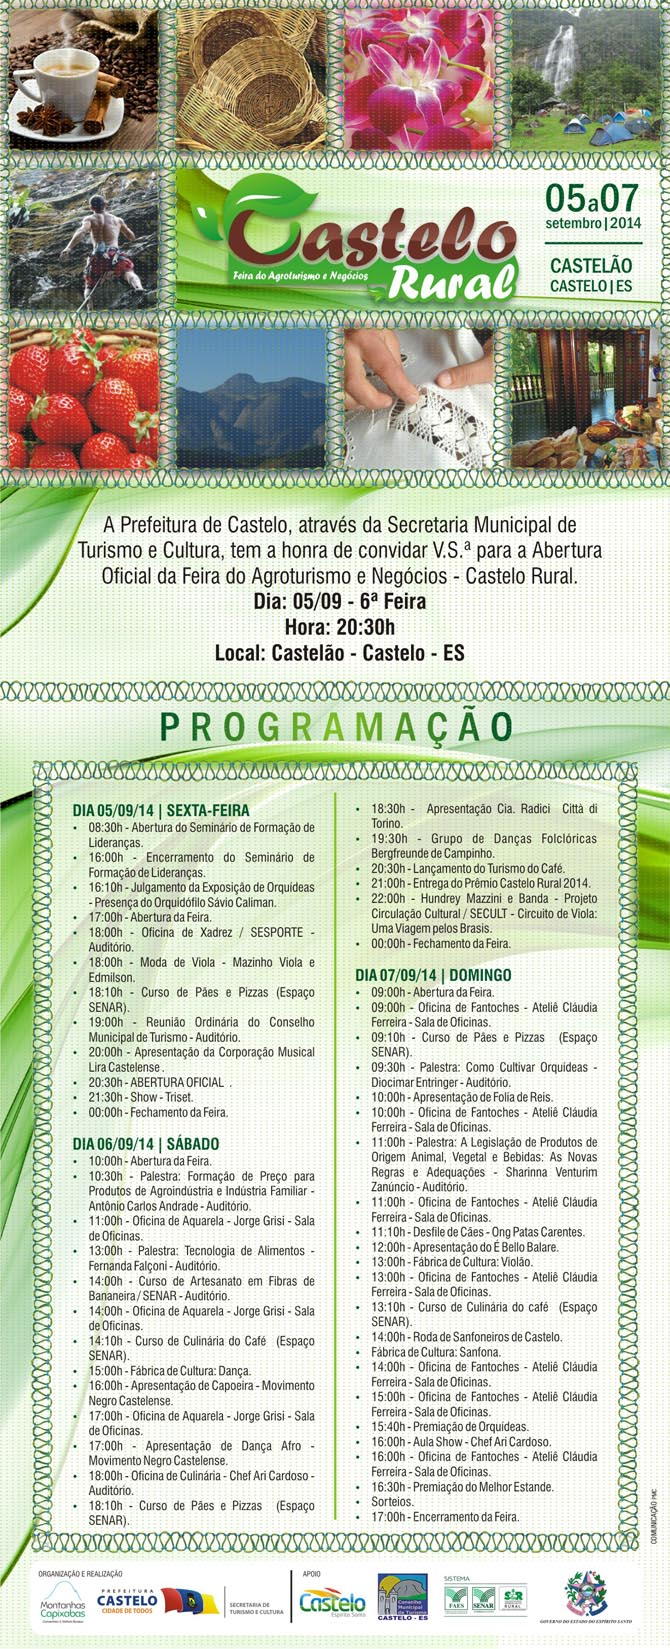 Castelo Rural 2014 - convite1